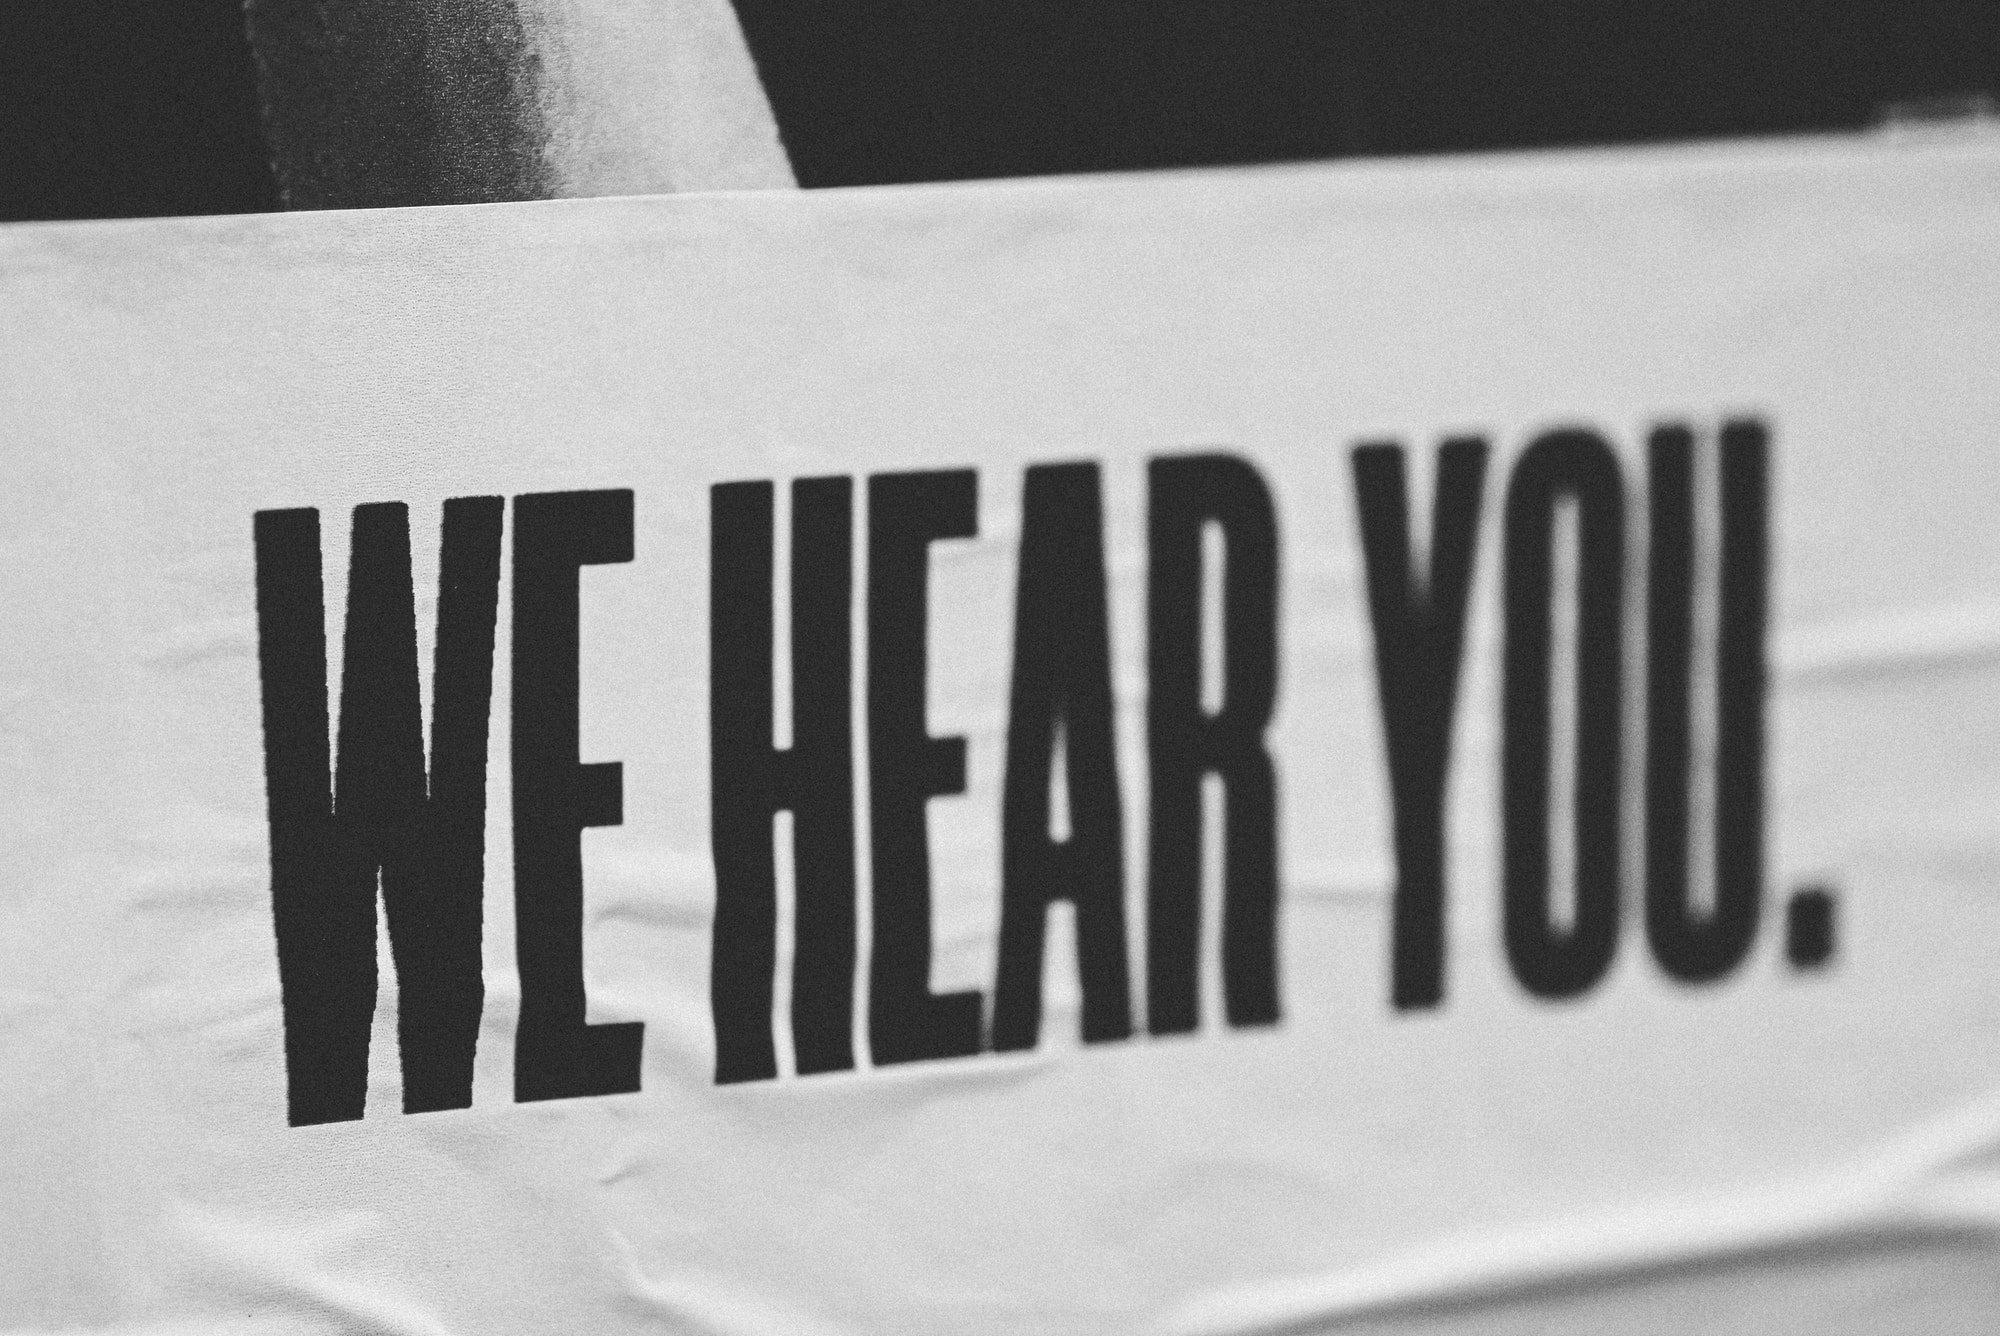 Digital Marketing Challenges - We Hear You Banner